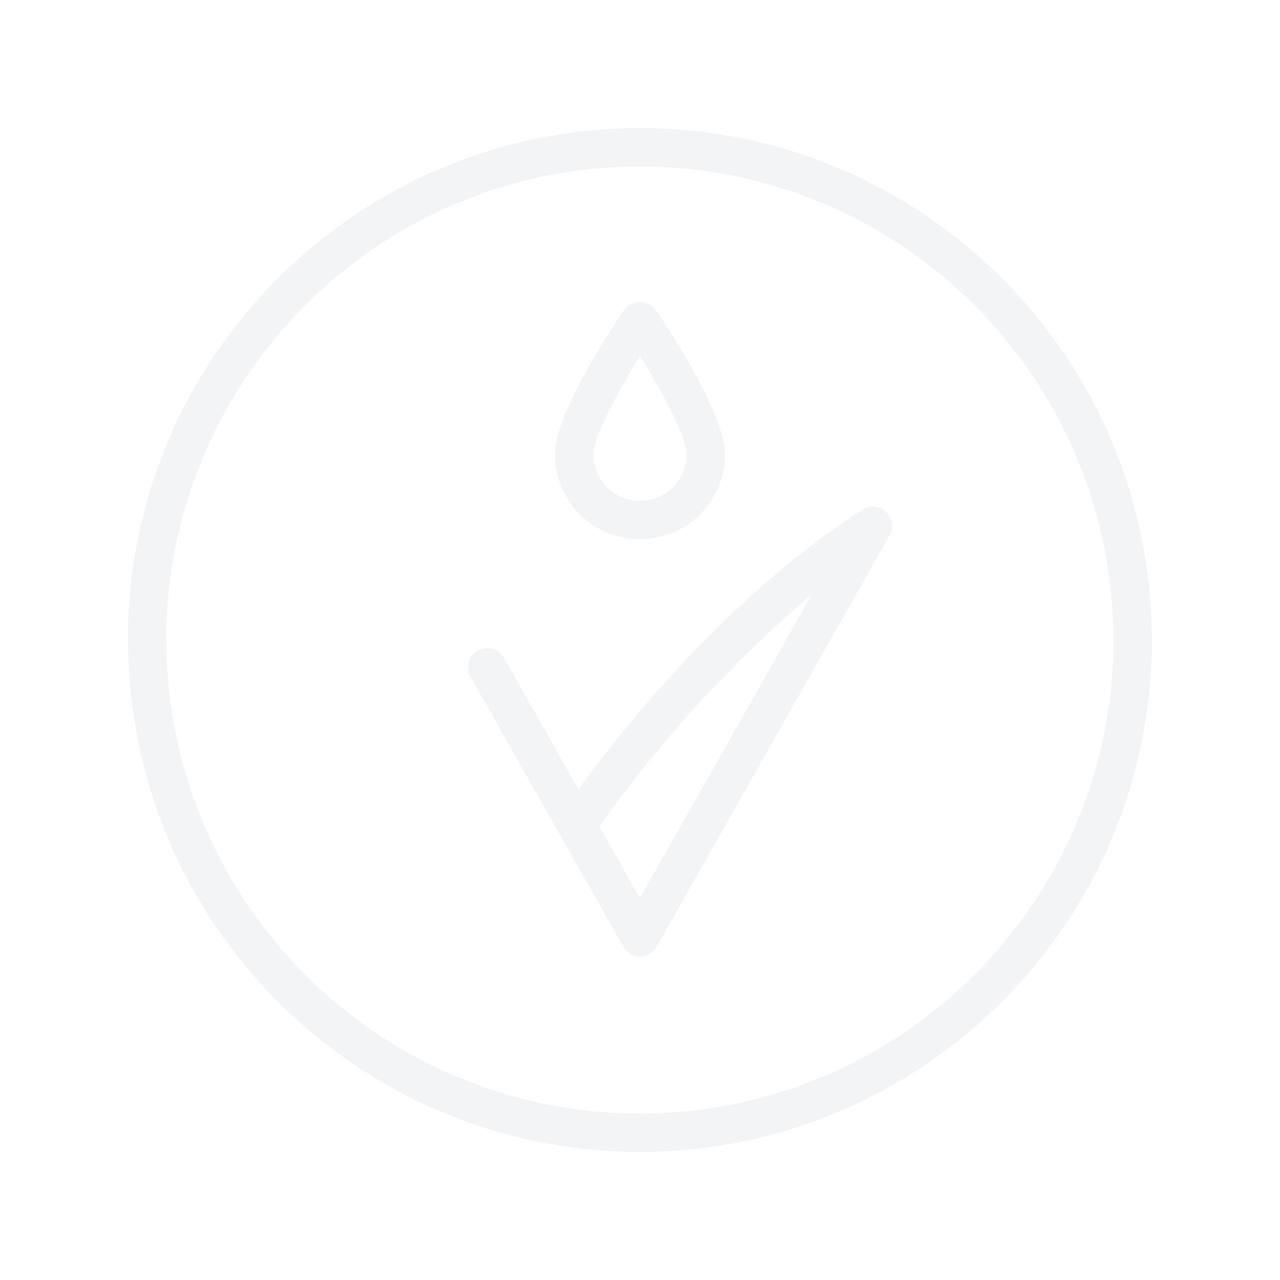 TURBLISS Deeply Hydrating Peat Mask 180ml